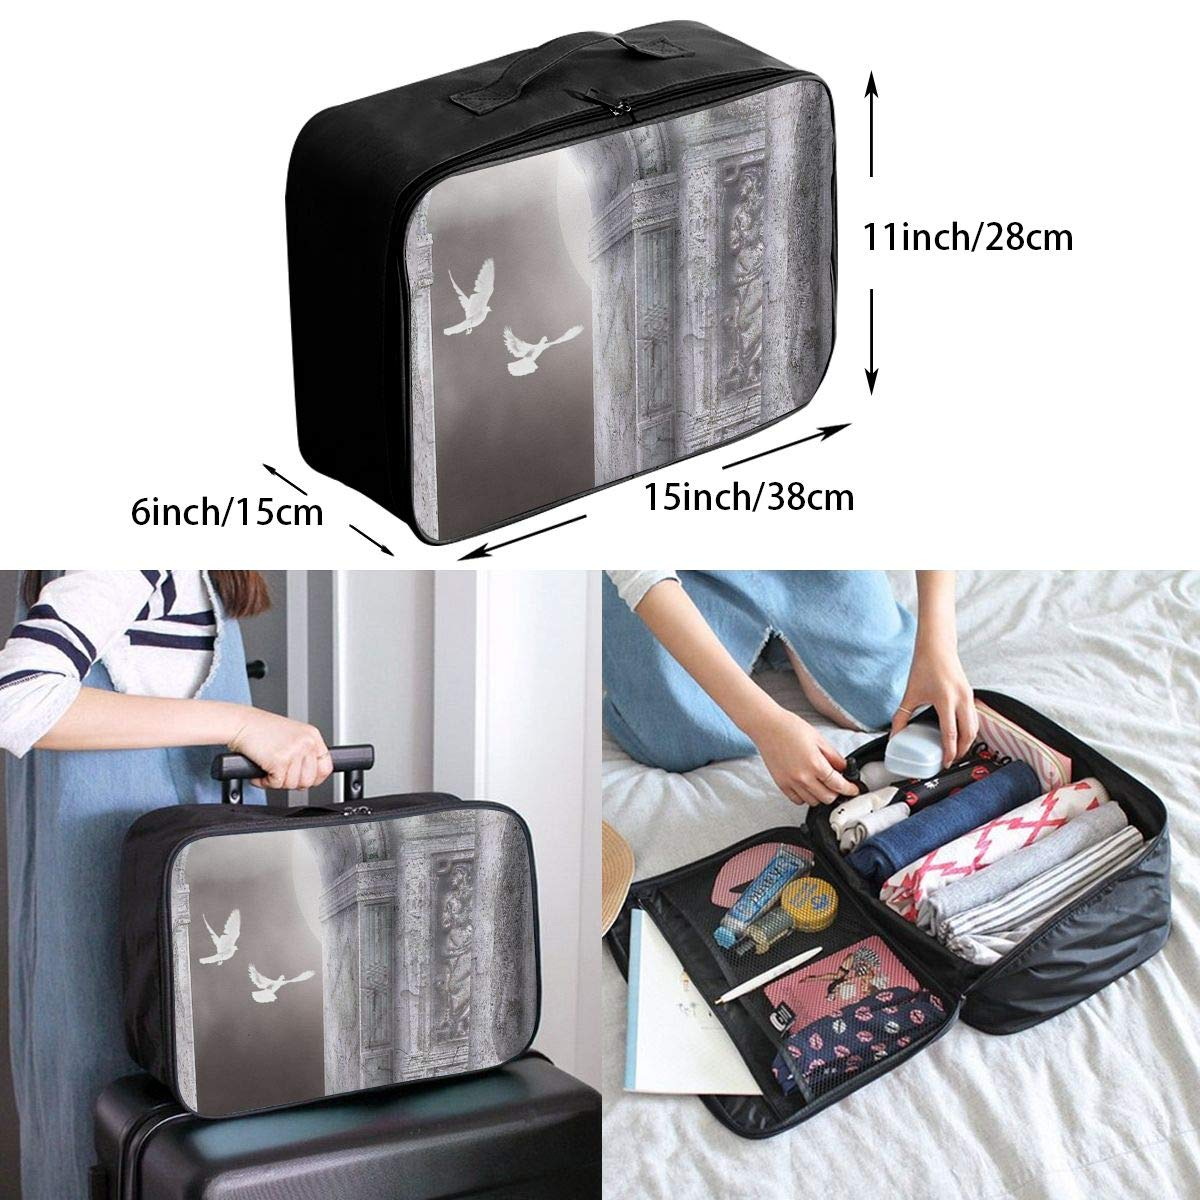 Travel Luggage Duffle Bag Lightweight Portable Handbag Dove Of Peace Print Large Capacity Waterproof Foldable Storage Tote